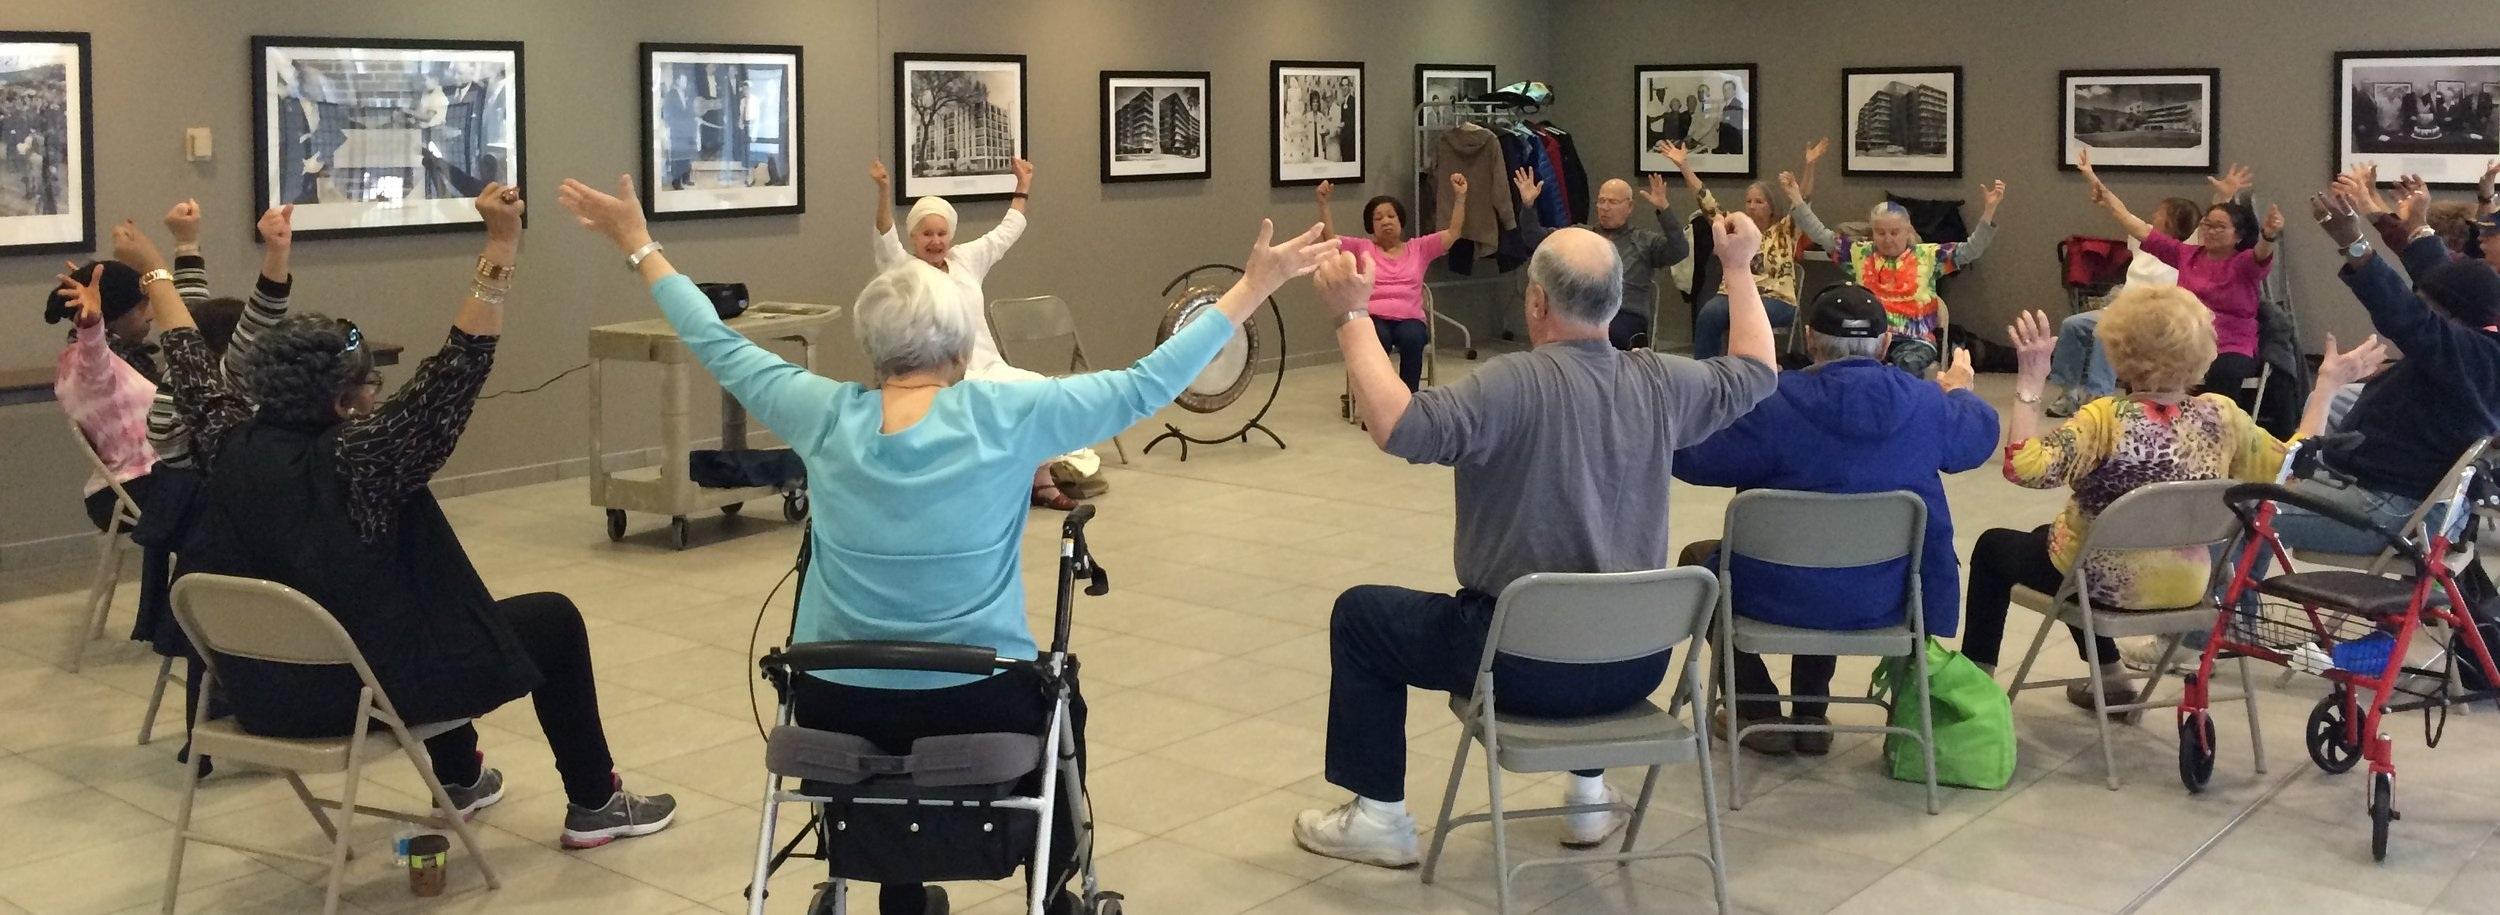 Weiss Hospital Senior Center Class - 2016 - Sat Sevak Kaur Level 1 Teacher leads her Seniors through a beautiful series of movements, chanting and meditation.